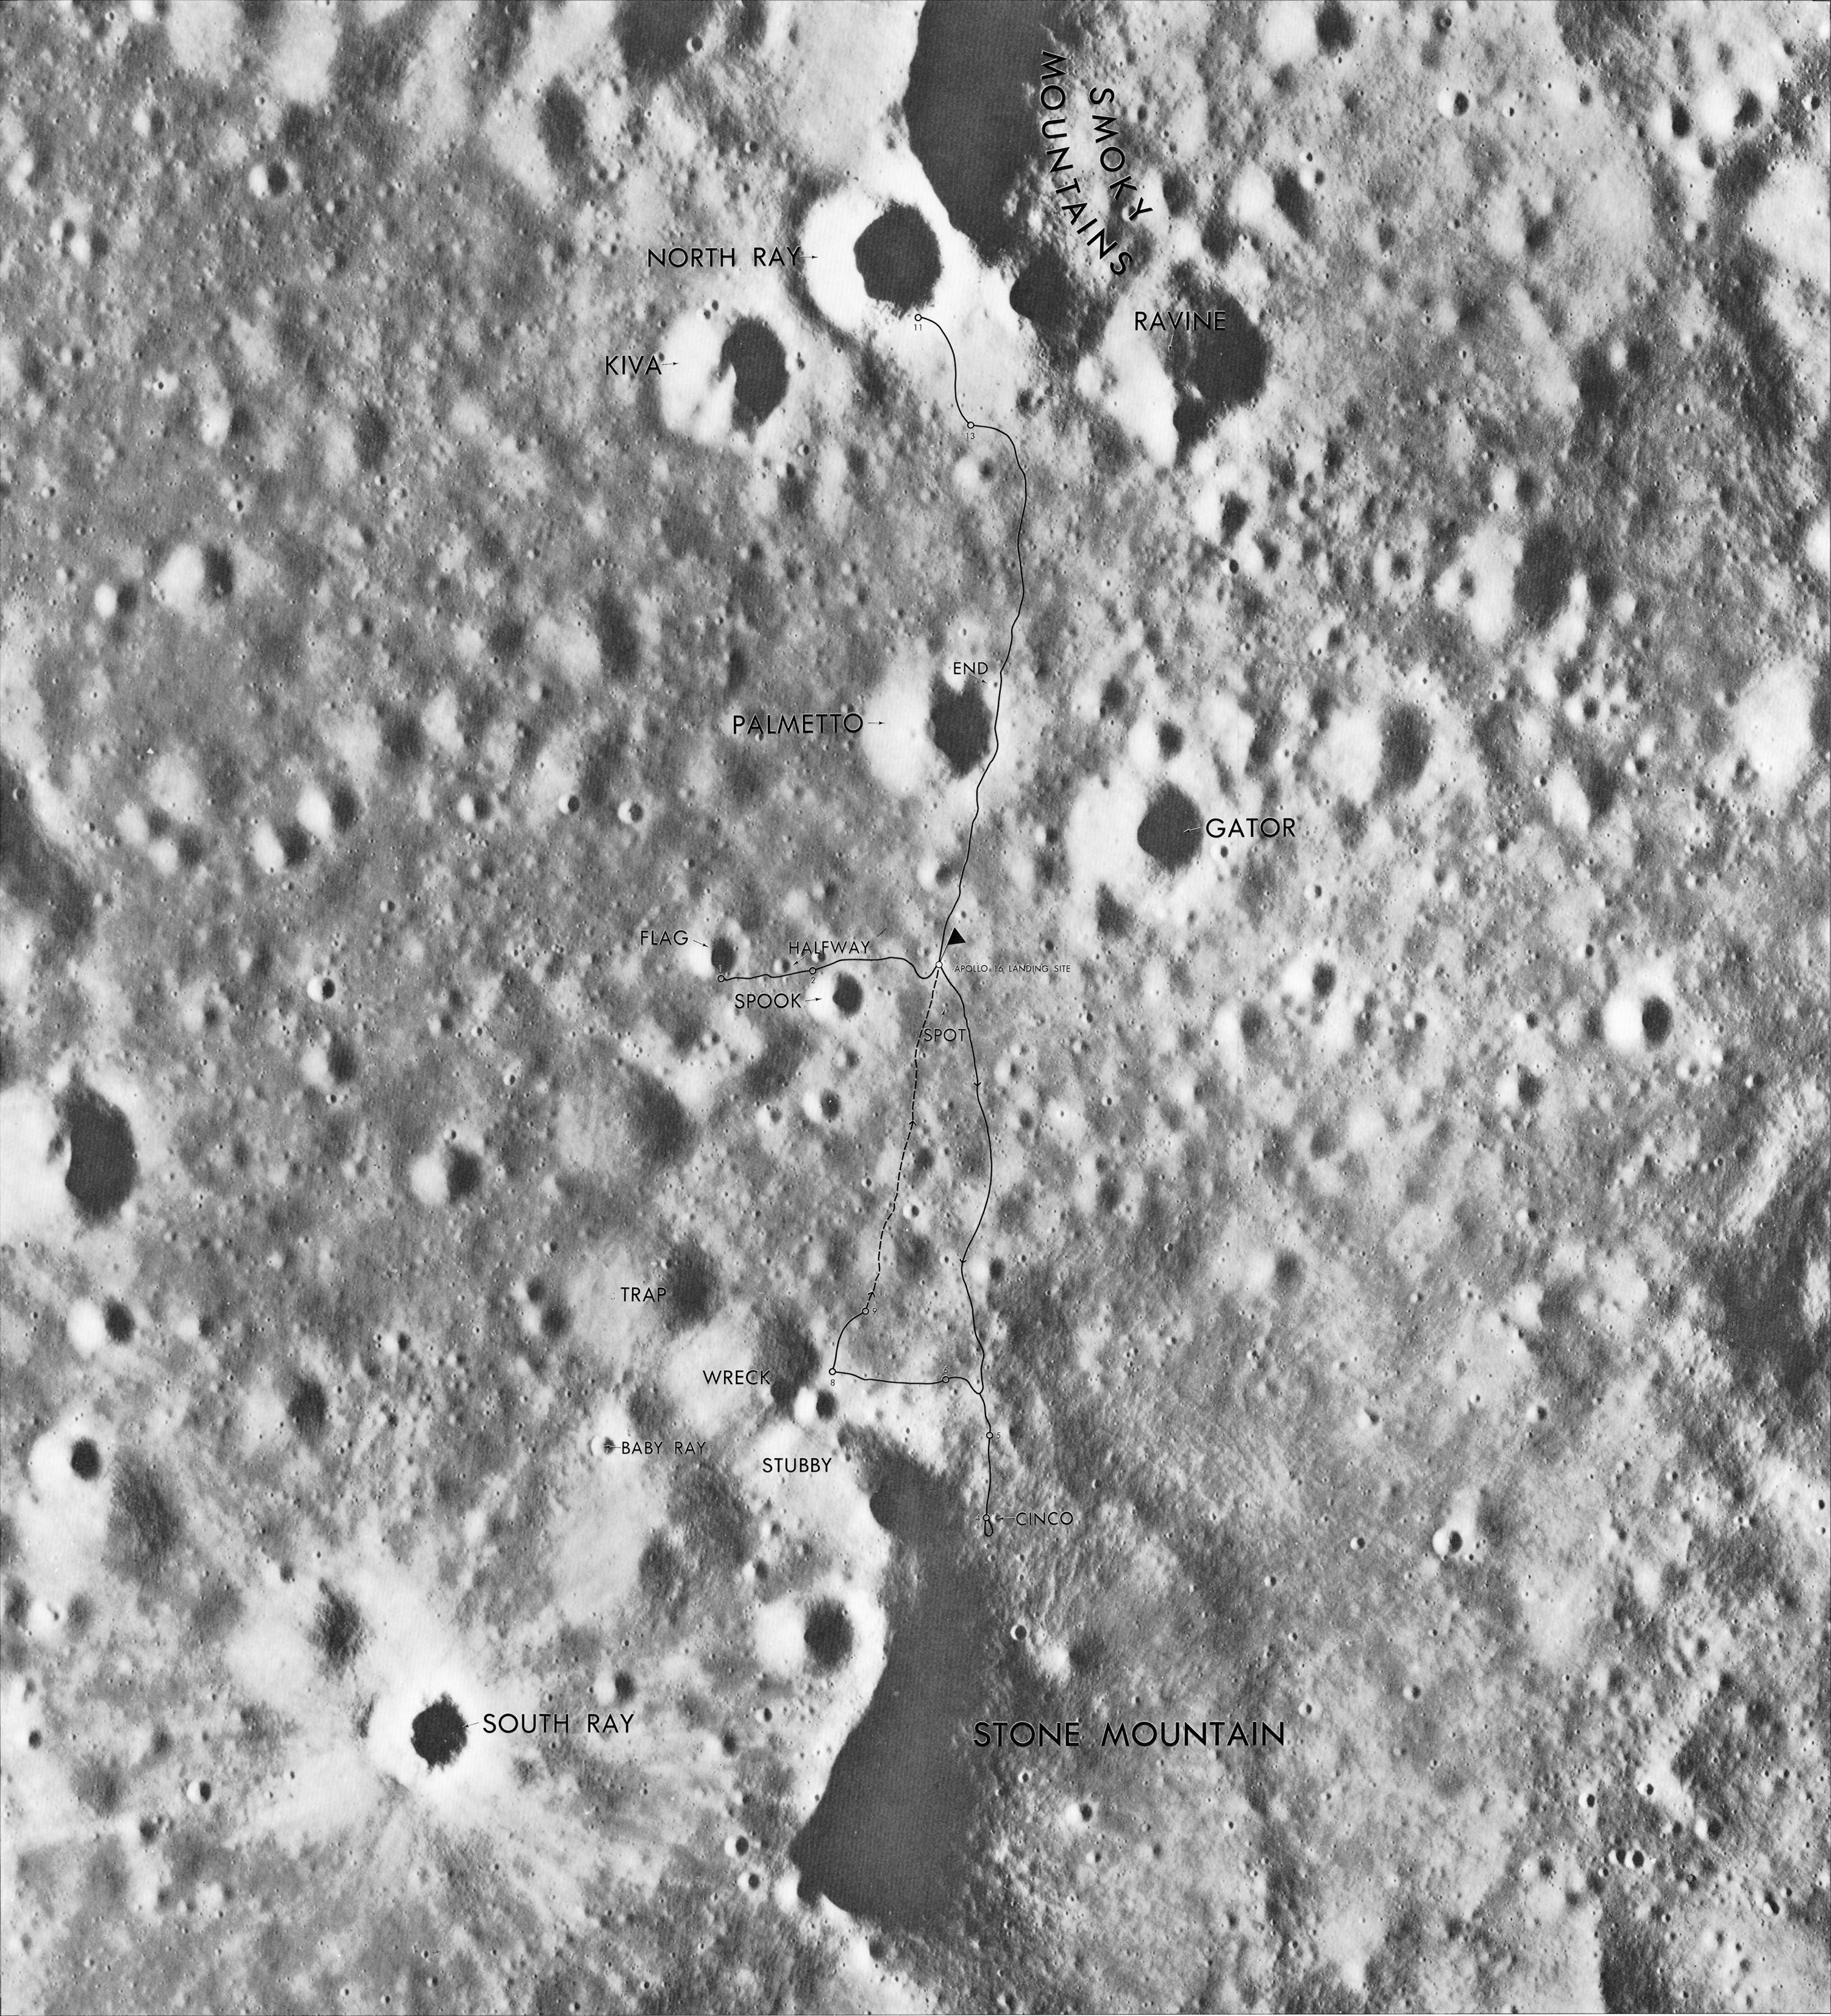 File:Apollo 16 landingsite.jpg - Wikimedia Commons